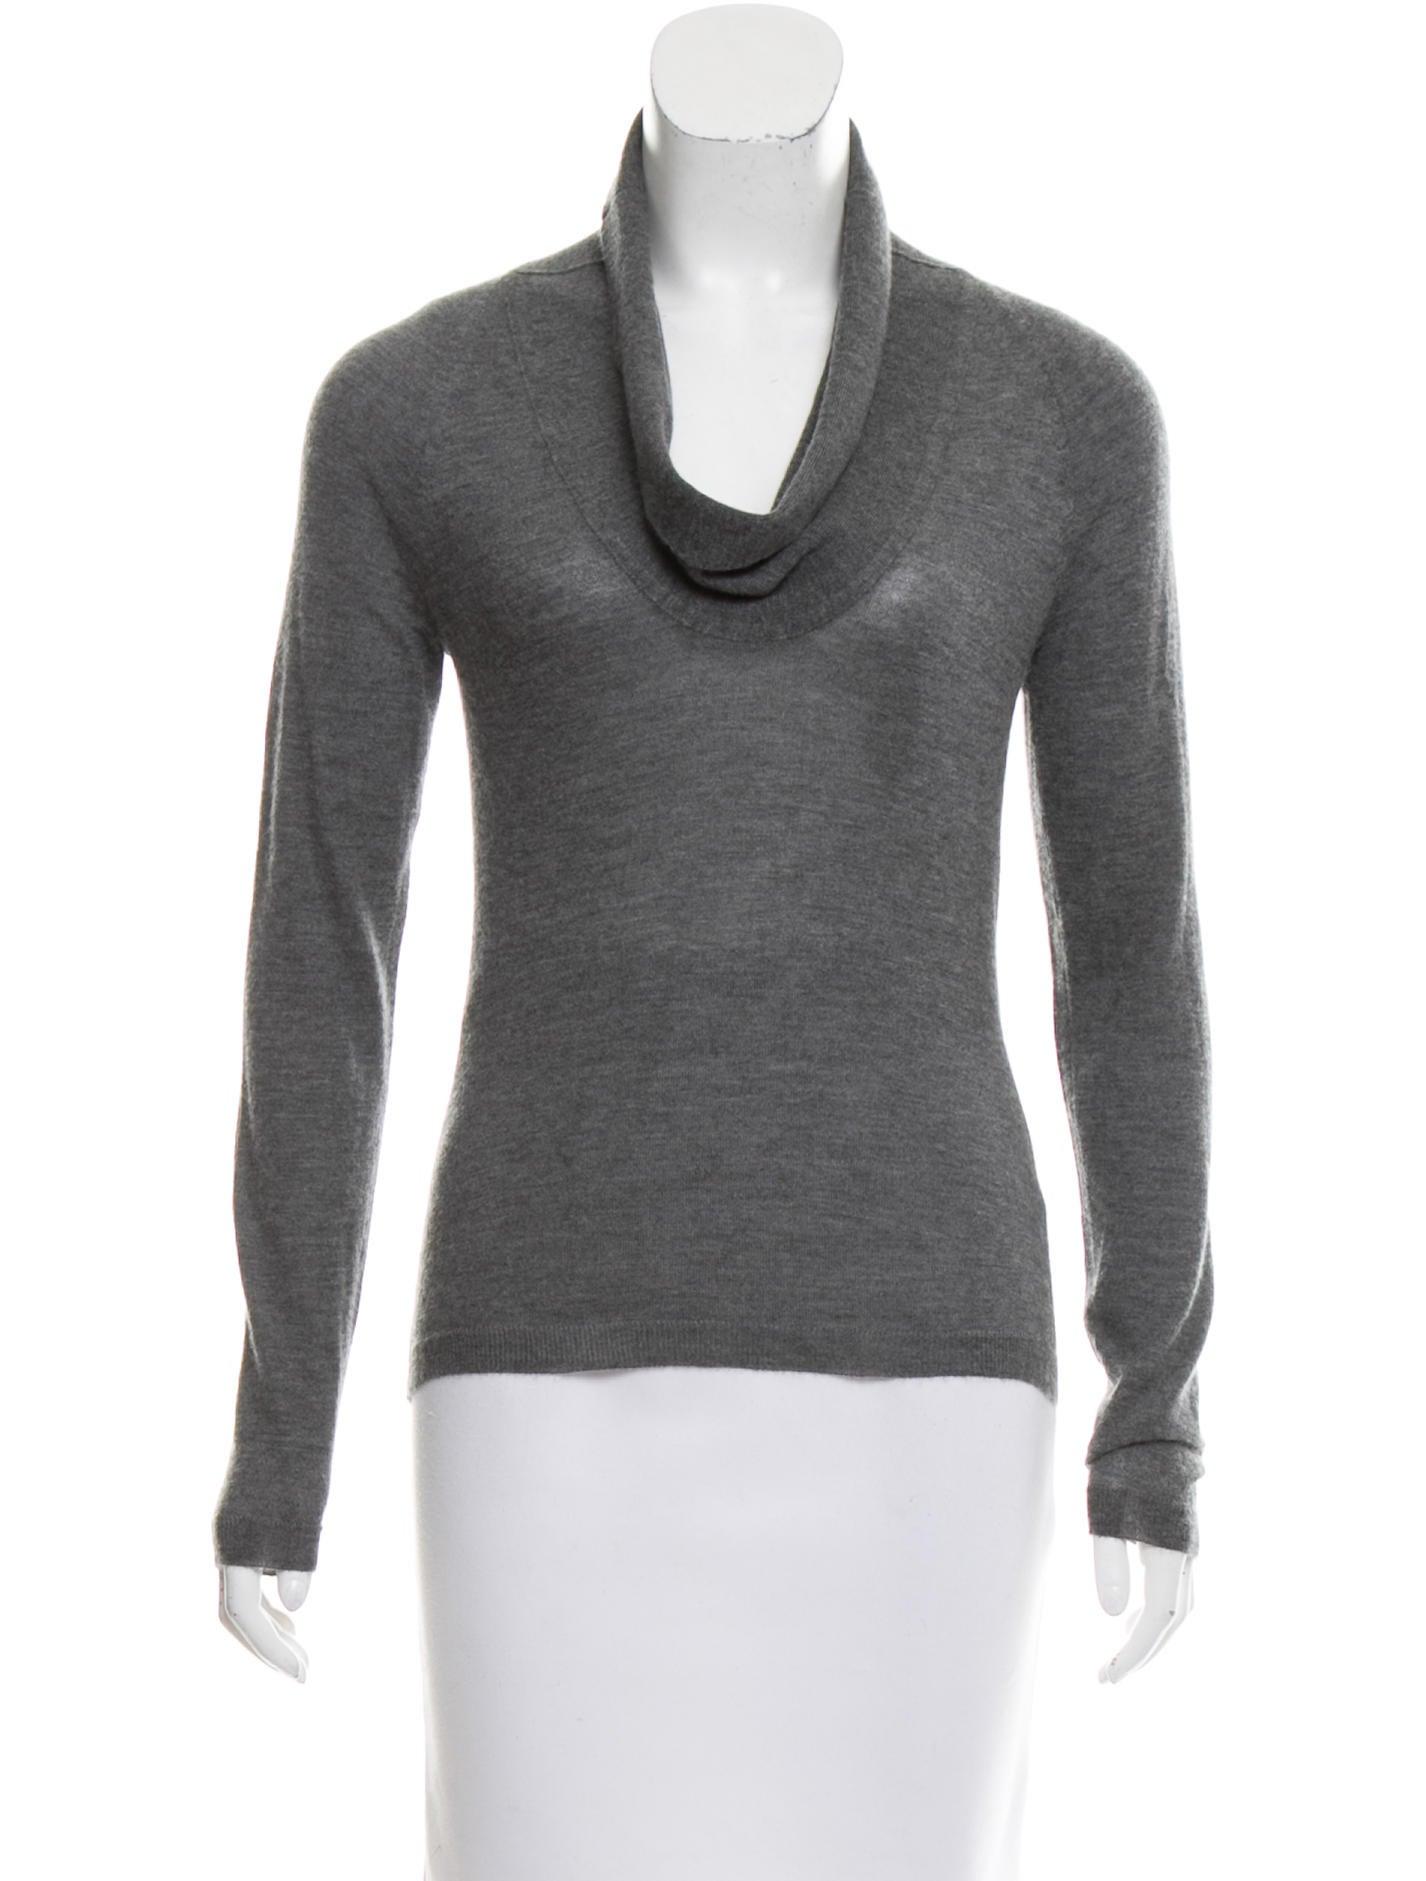 Céline Lightweight Cashmere Sweater - Clothing - CEL54737 | The ...